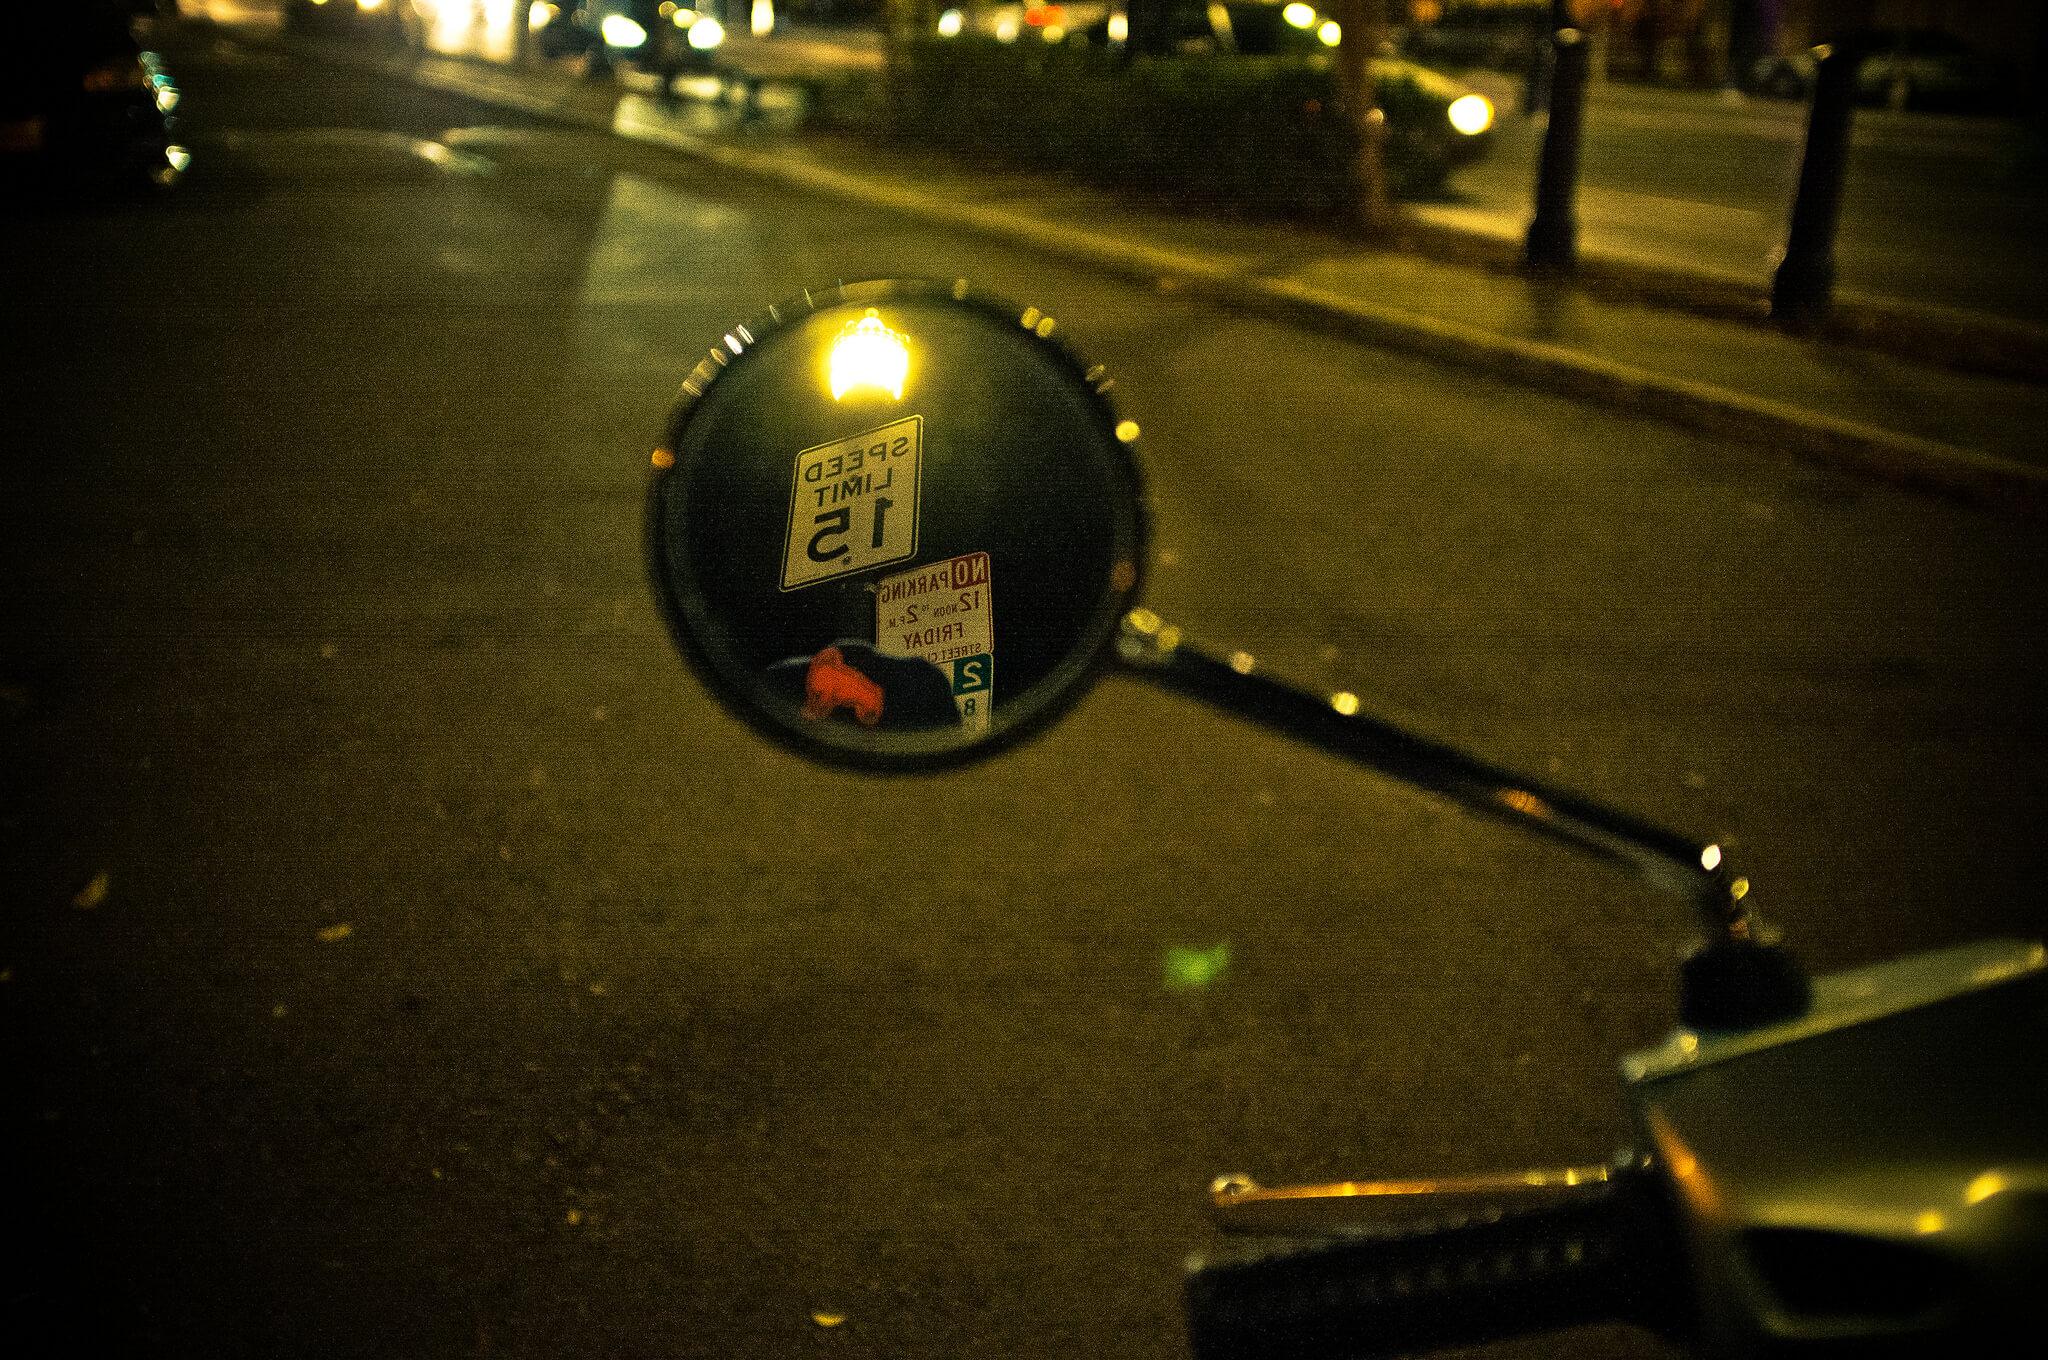 San Francisco speed limit